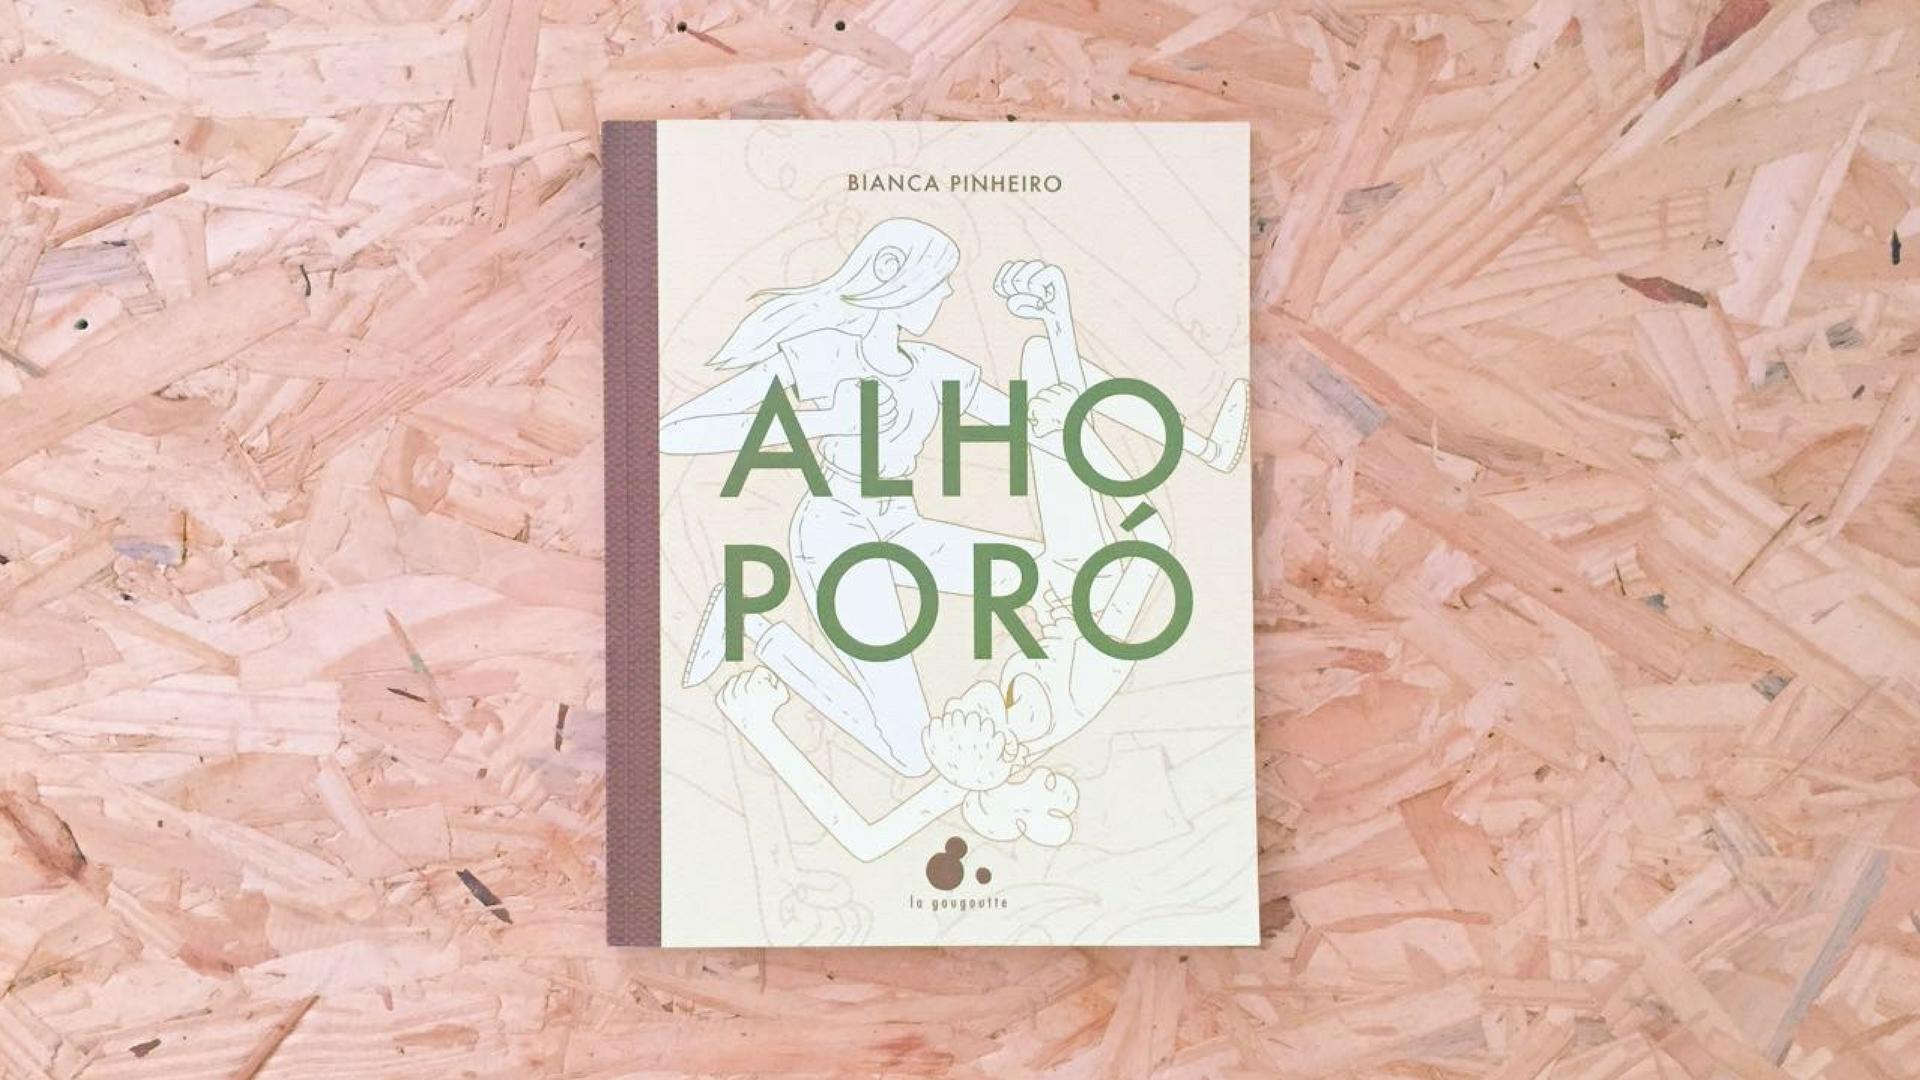 Alho_poro